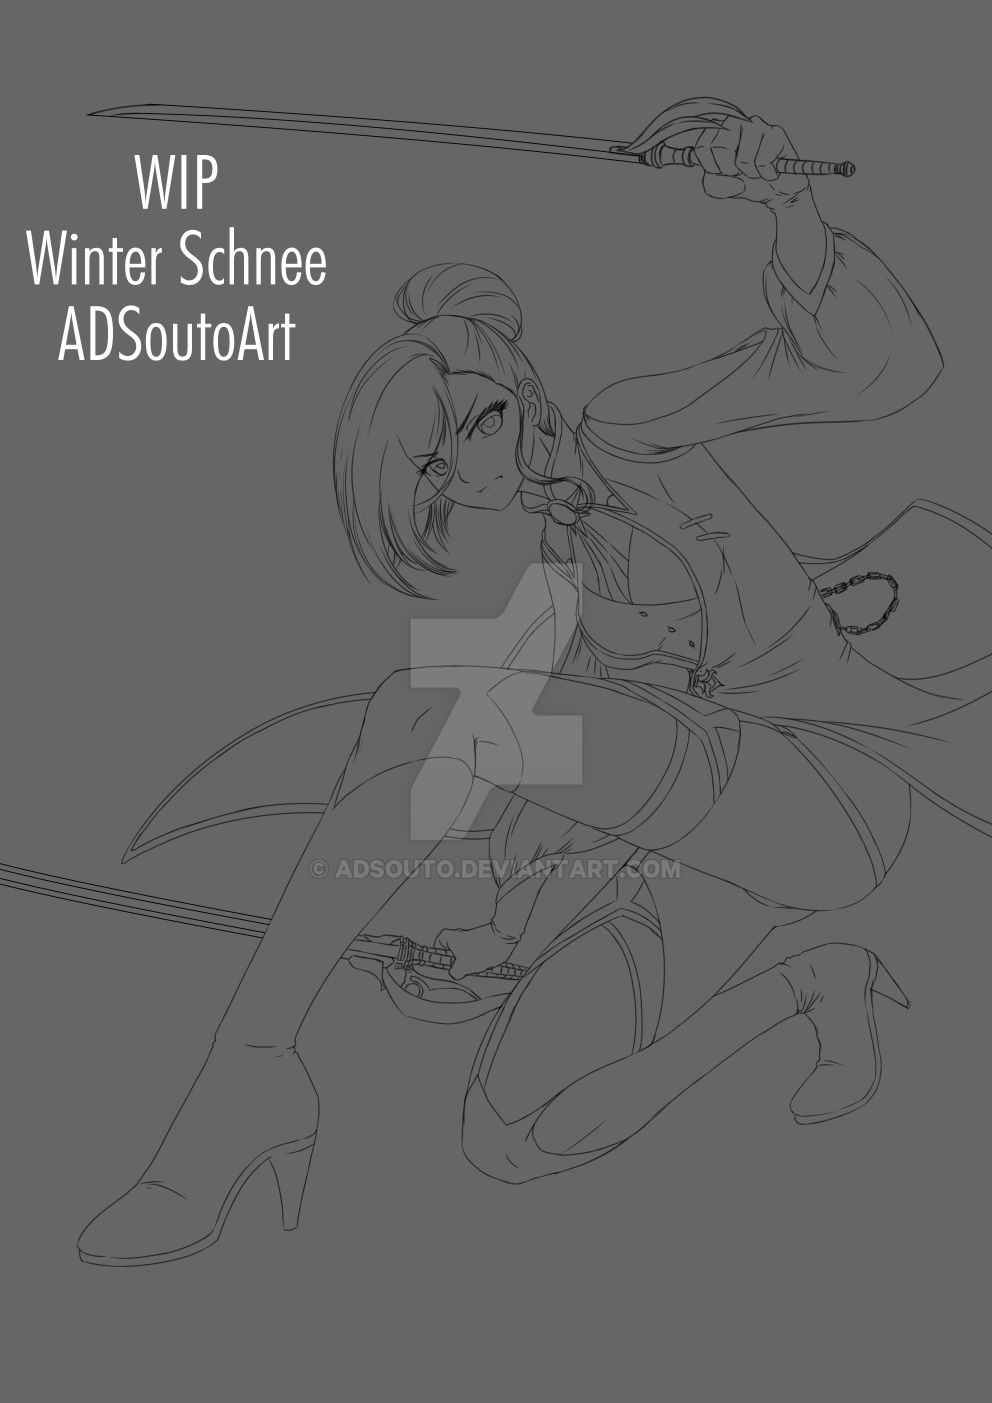 WIP Winter Schnee by ADSouto